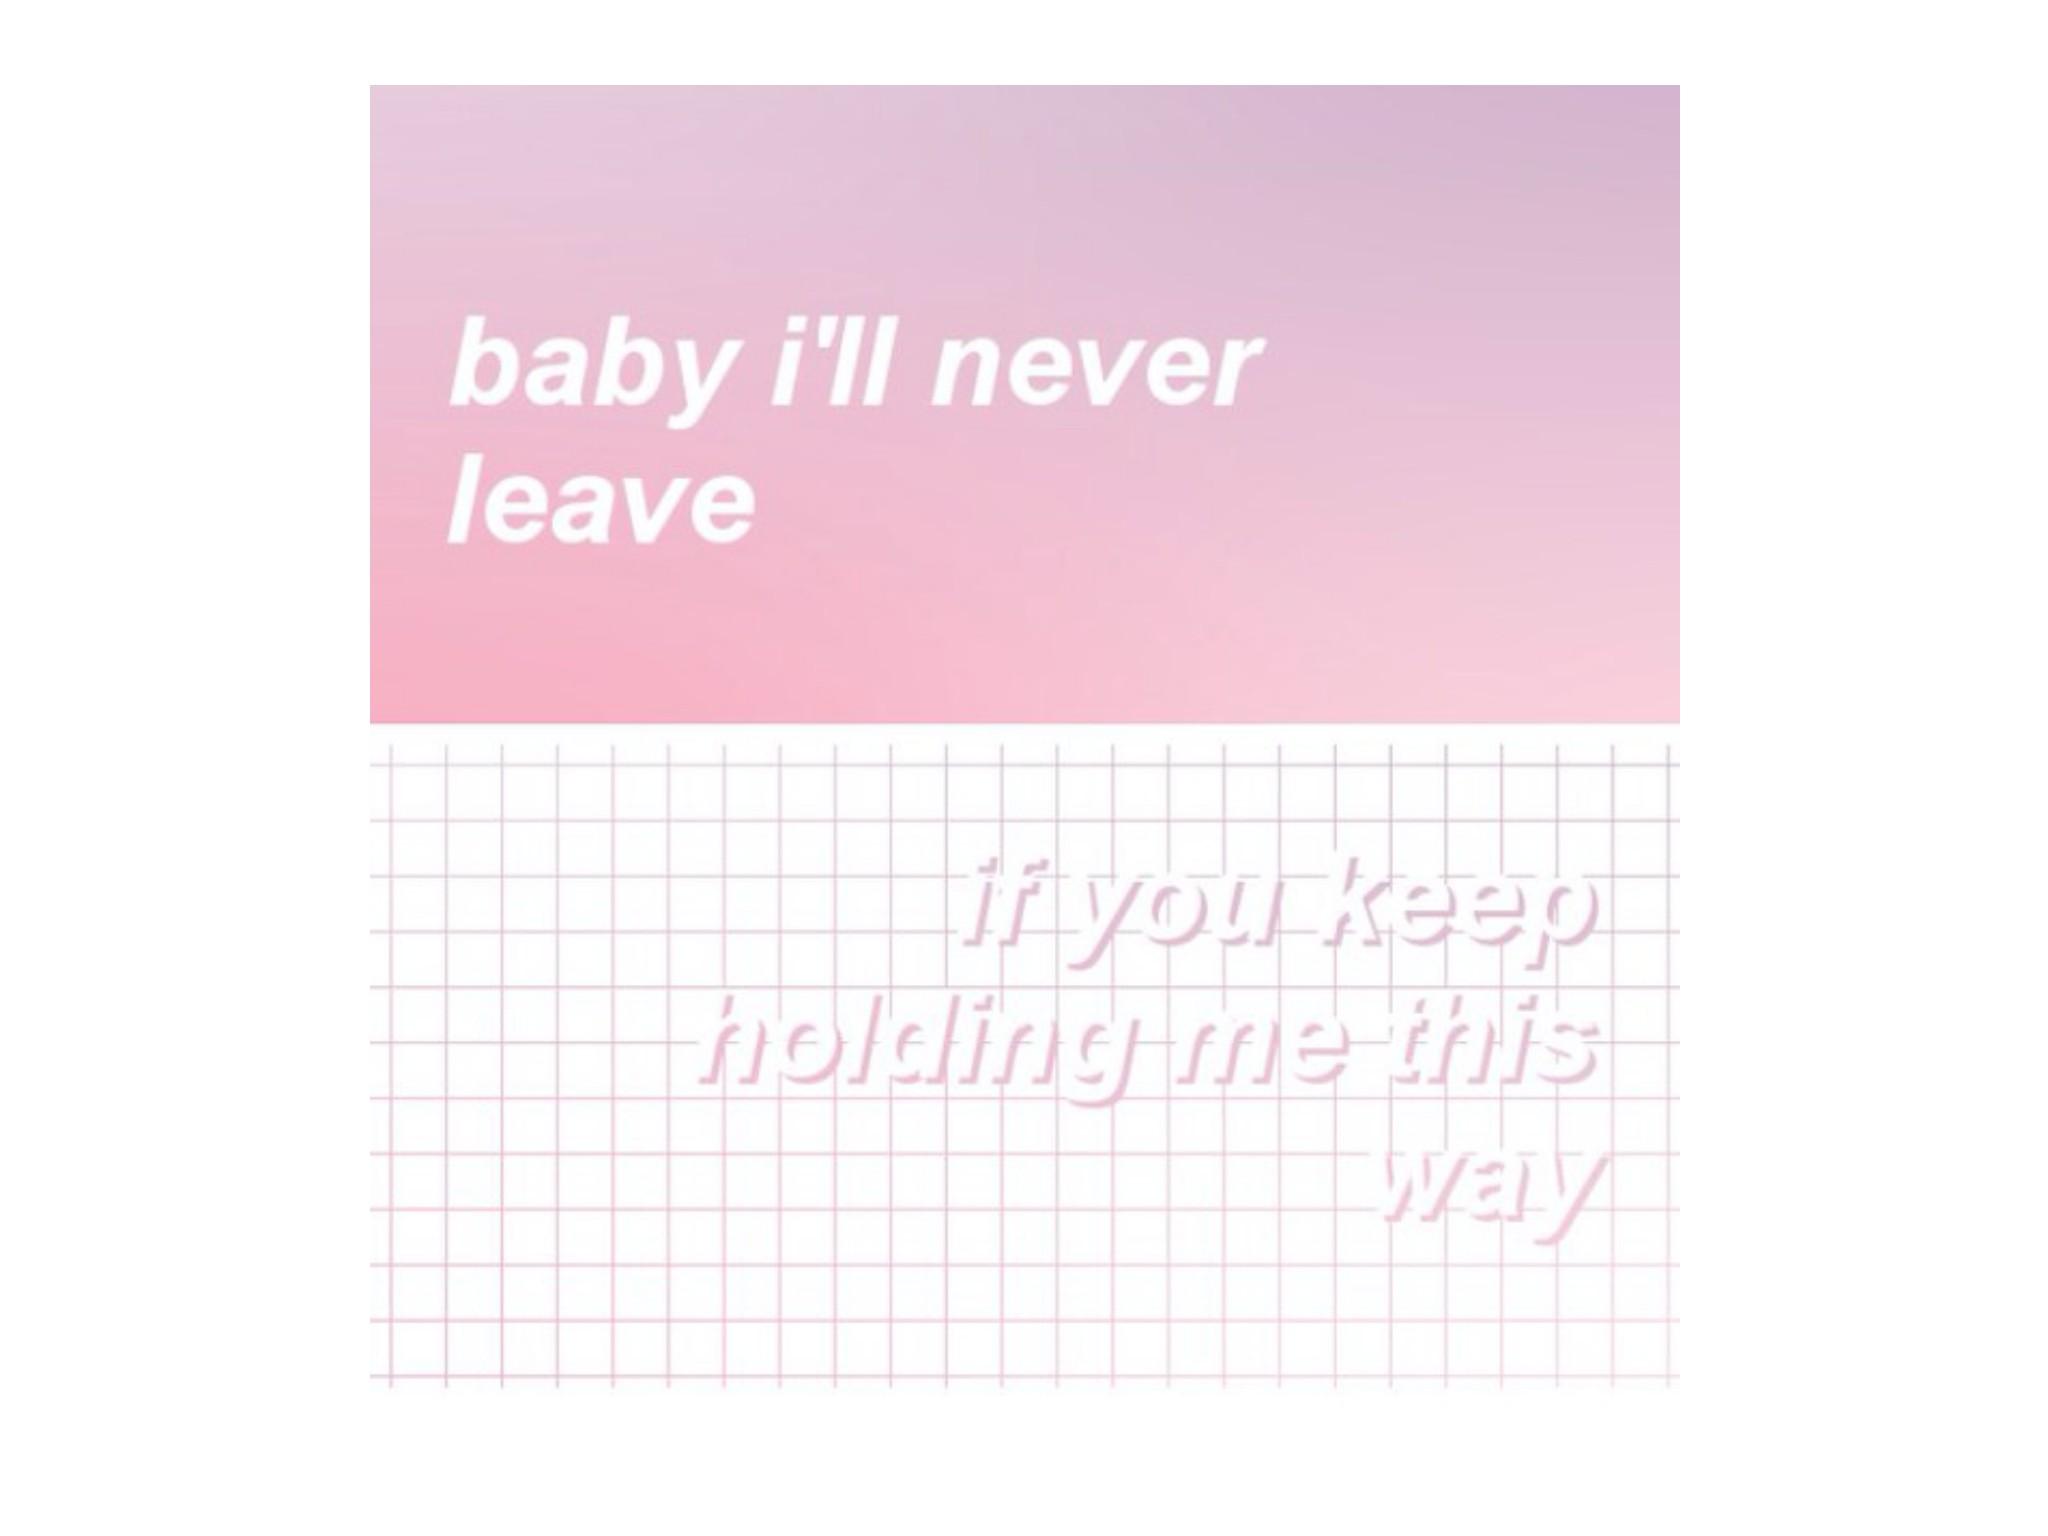 Aesthetic Grunge Softgrunge Pastel Tumblr Love Pink Quo Jpg 1365x1024